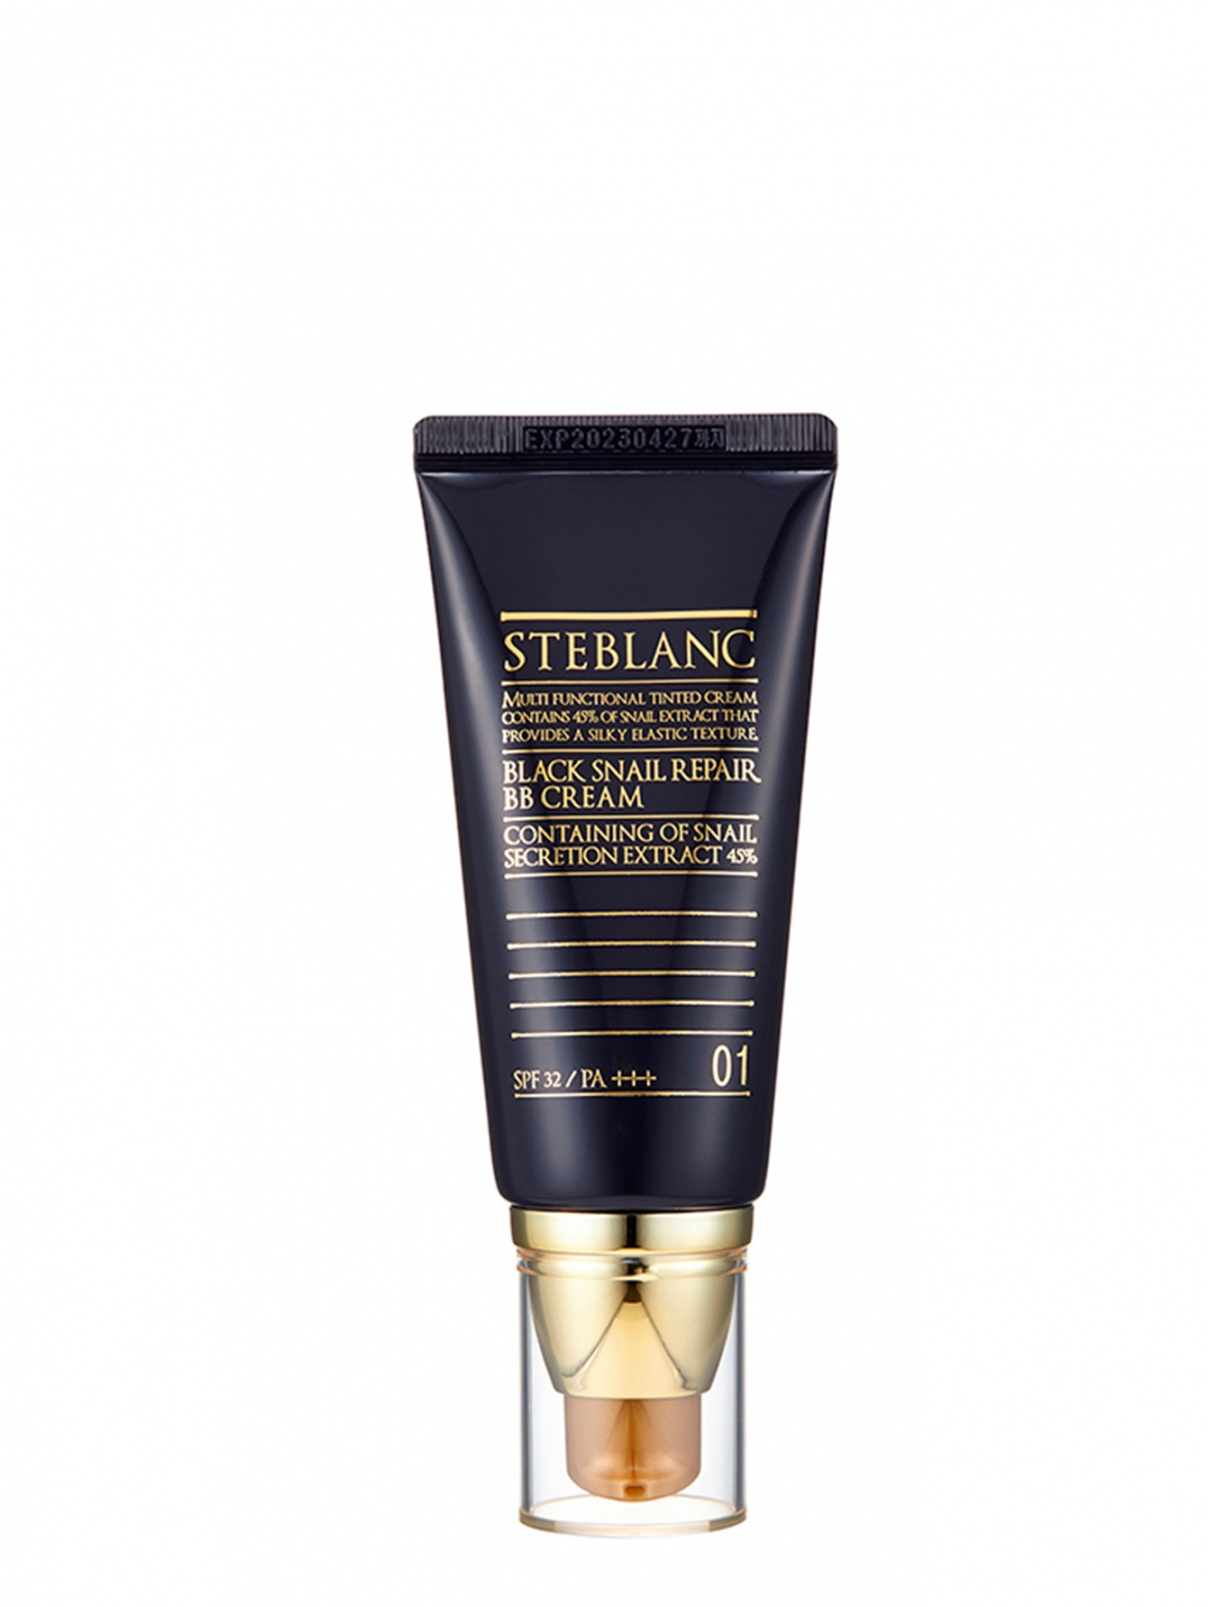 Black Snail Repair BB Cream / ВВ крем с муцином Чёрной улитки тон 01 (светлый беж) 50 мл STEBLANK  –  Общий вид